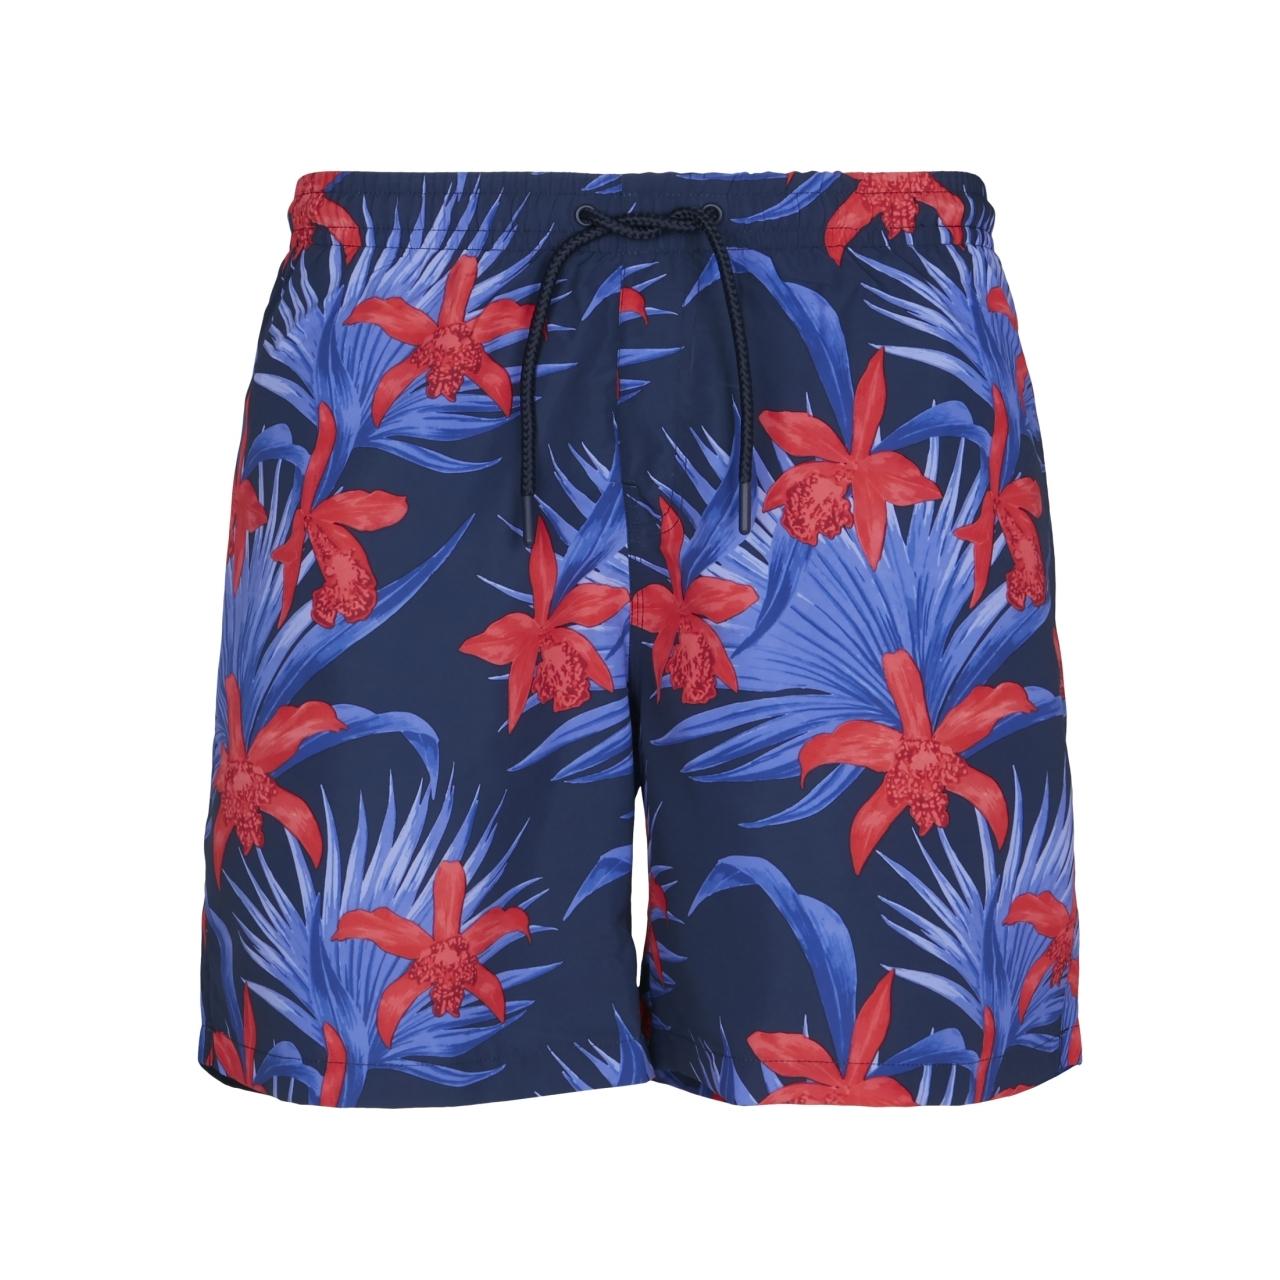 Plavky Urban Classics Pattern Flower - modré-červené, XL